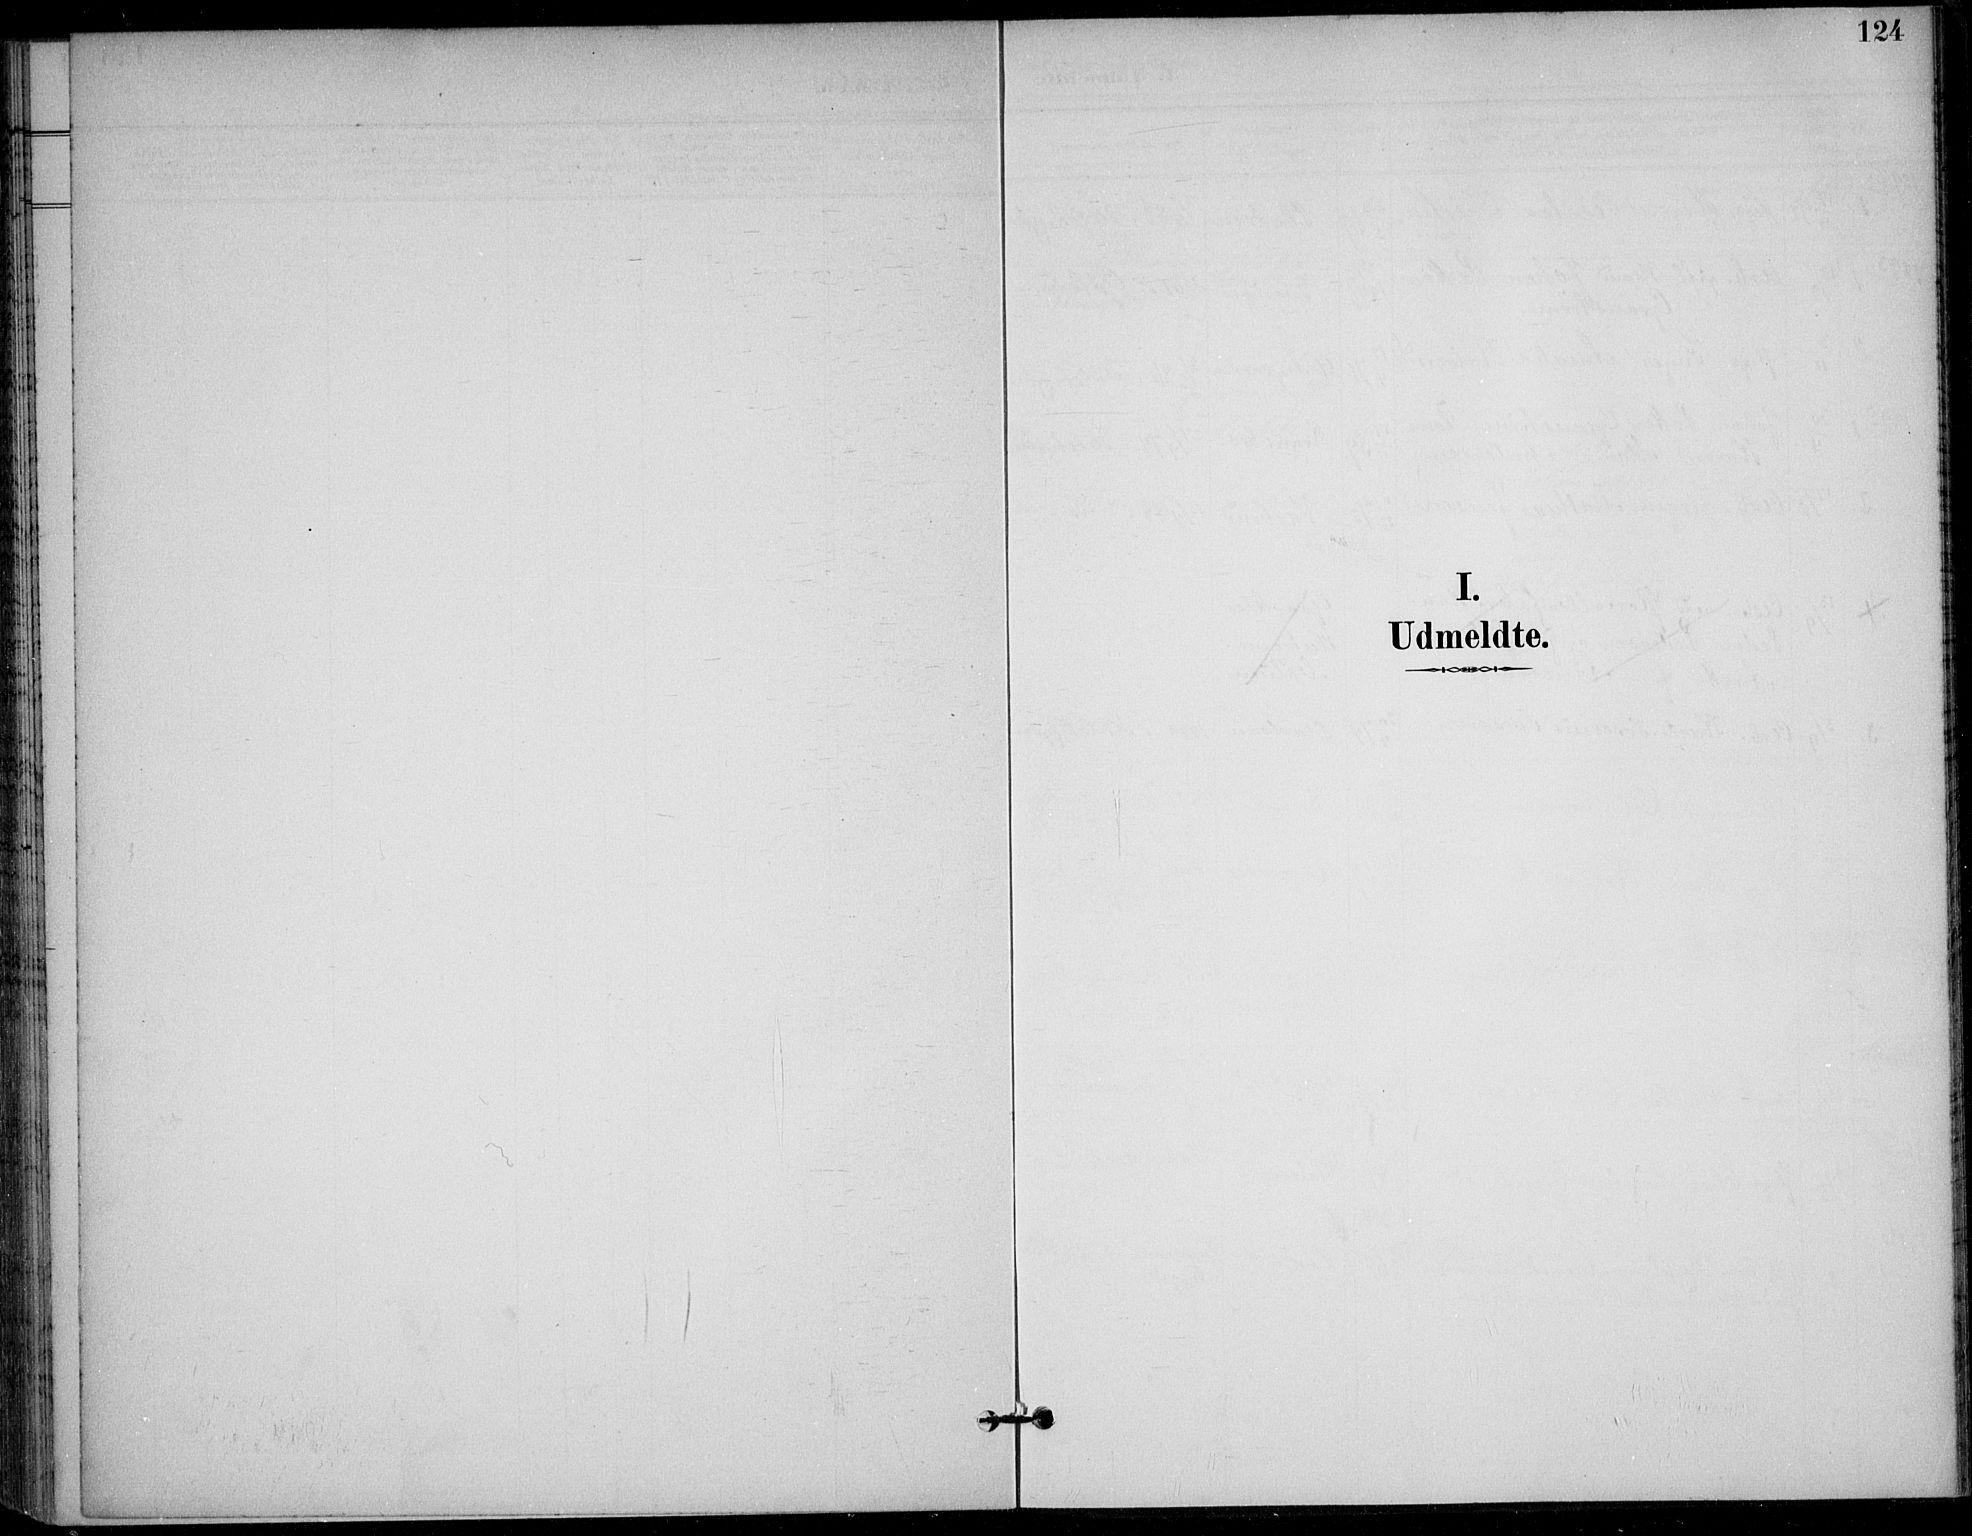 SAKO, Solum kirkebøker, F/Fc/L0002: Ministerialbok nr. III 2, 1892-1906, s. 124